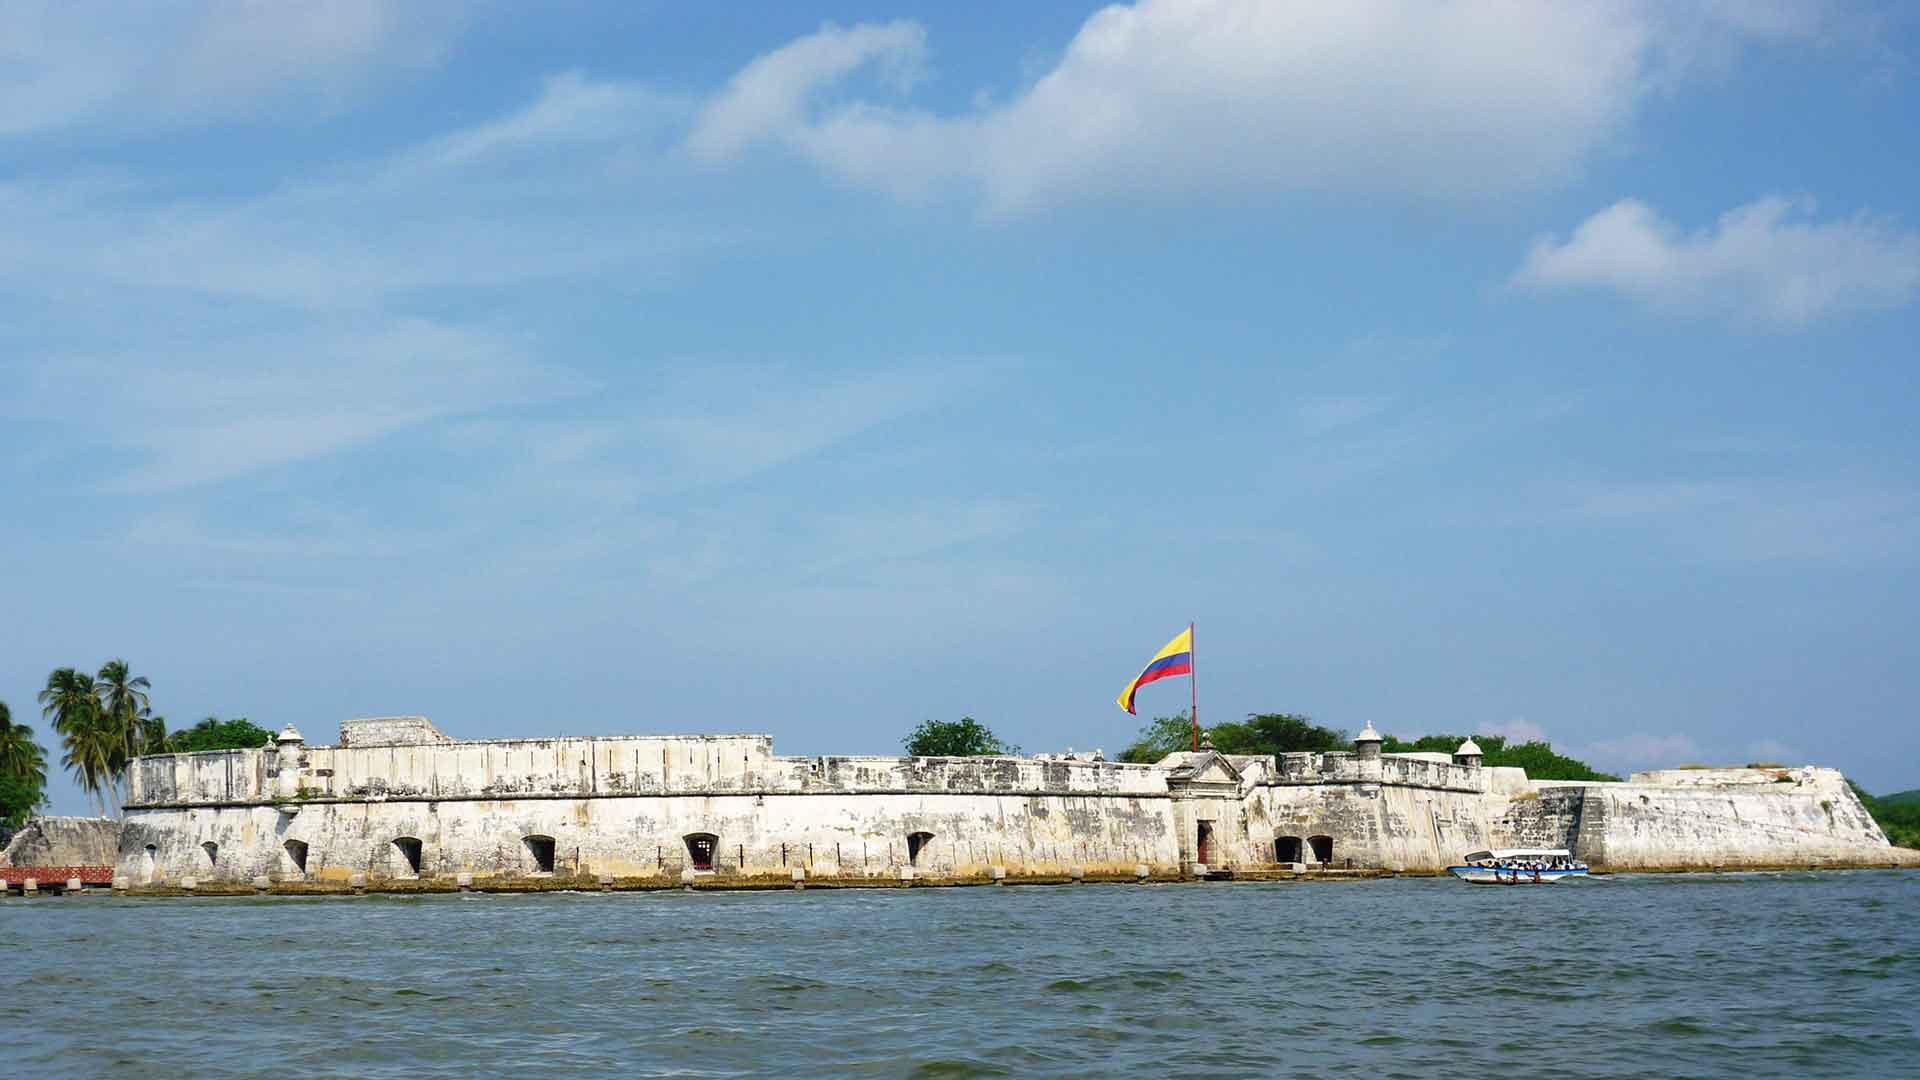 Cartagena de Indias hero asset